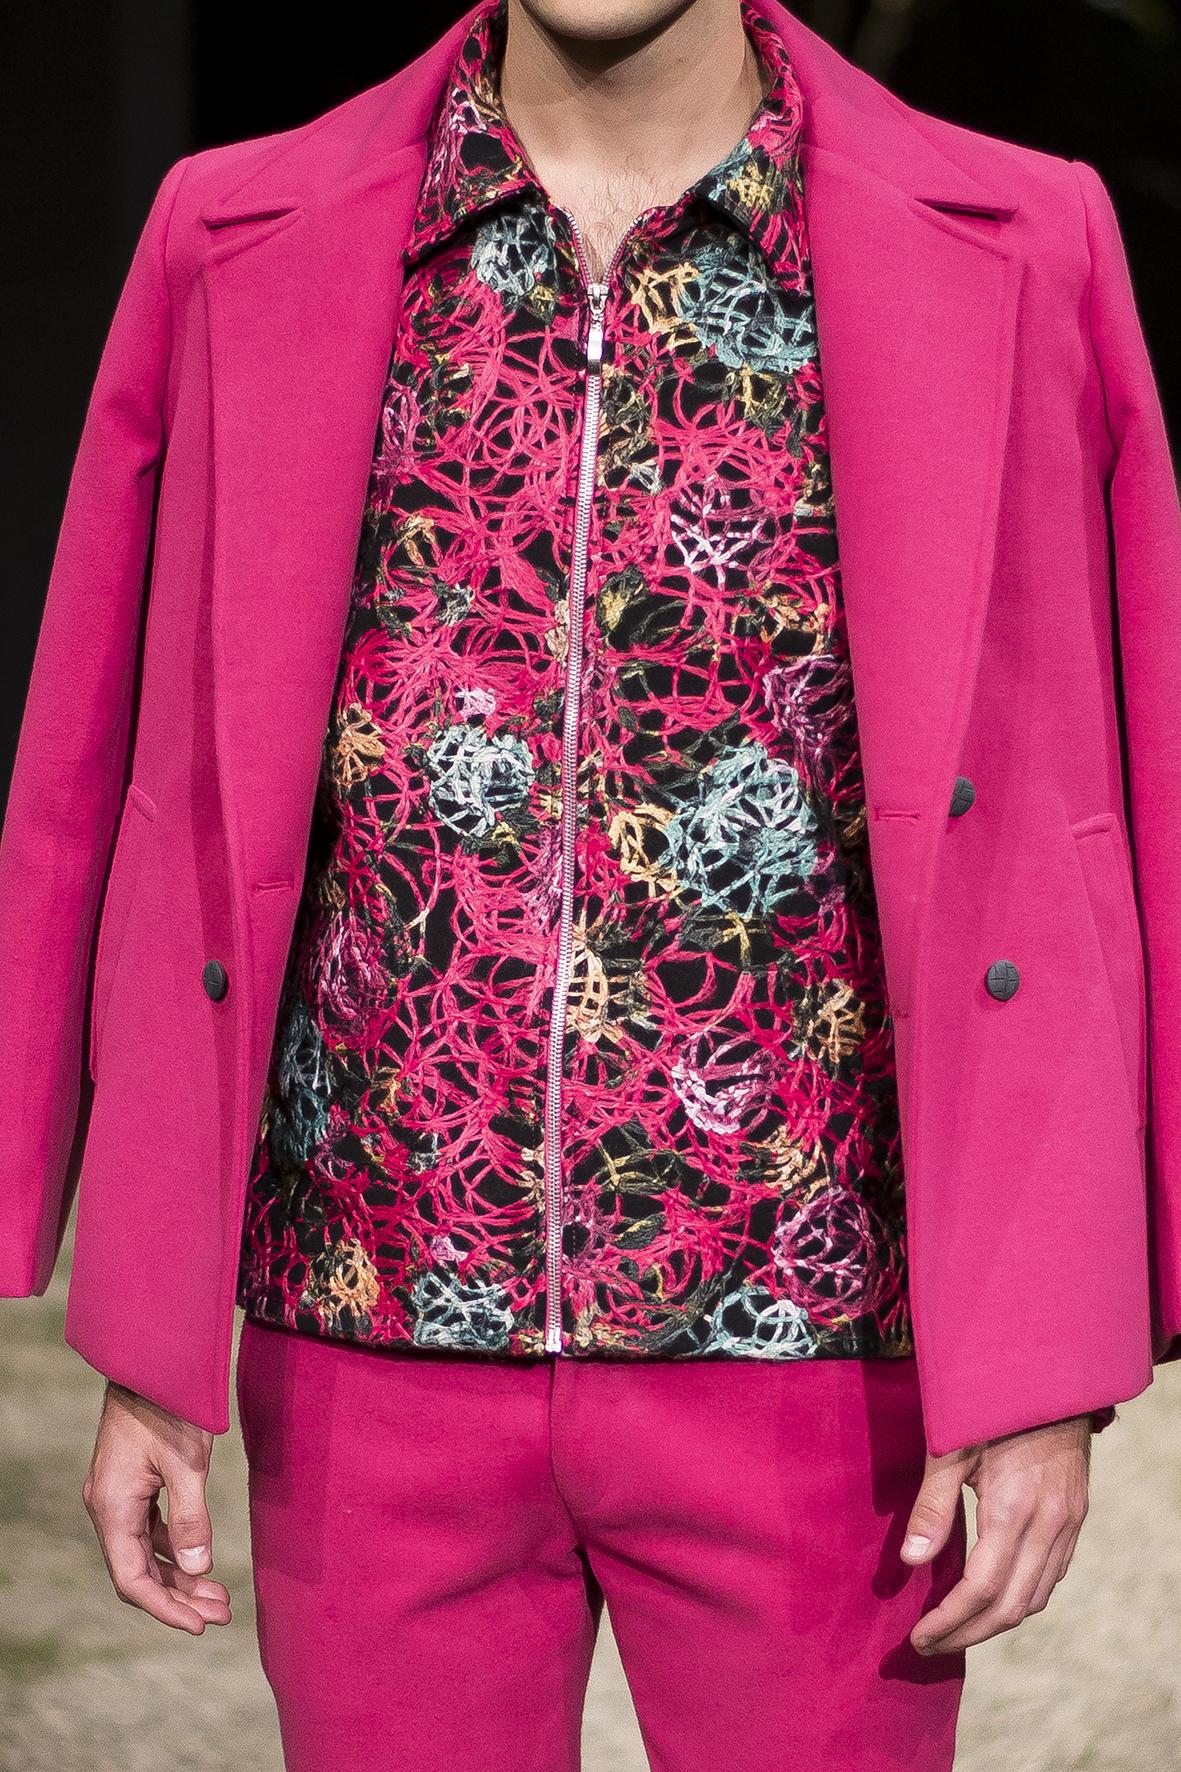 It Project evolet den tavara ceam enrique canales delrieu carolina tola eriko peru fashion moda peruana -  12.JPG